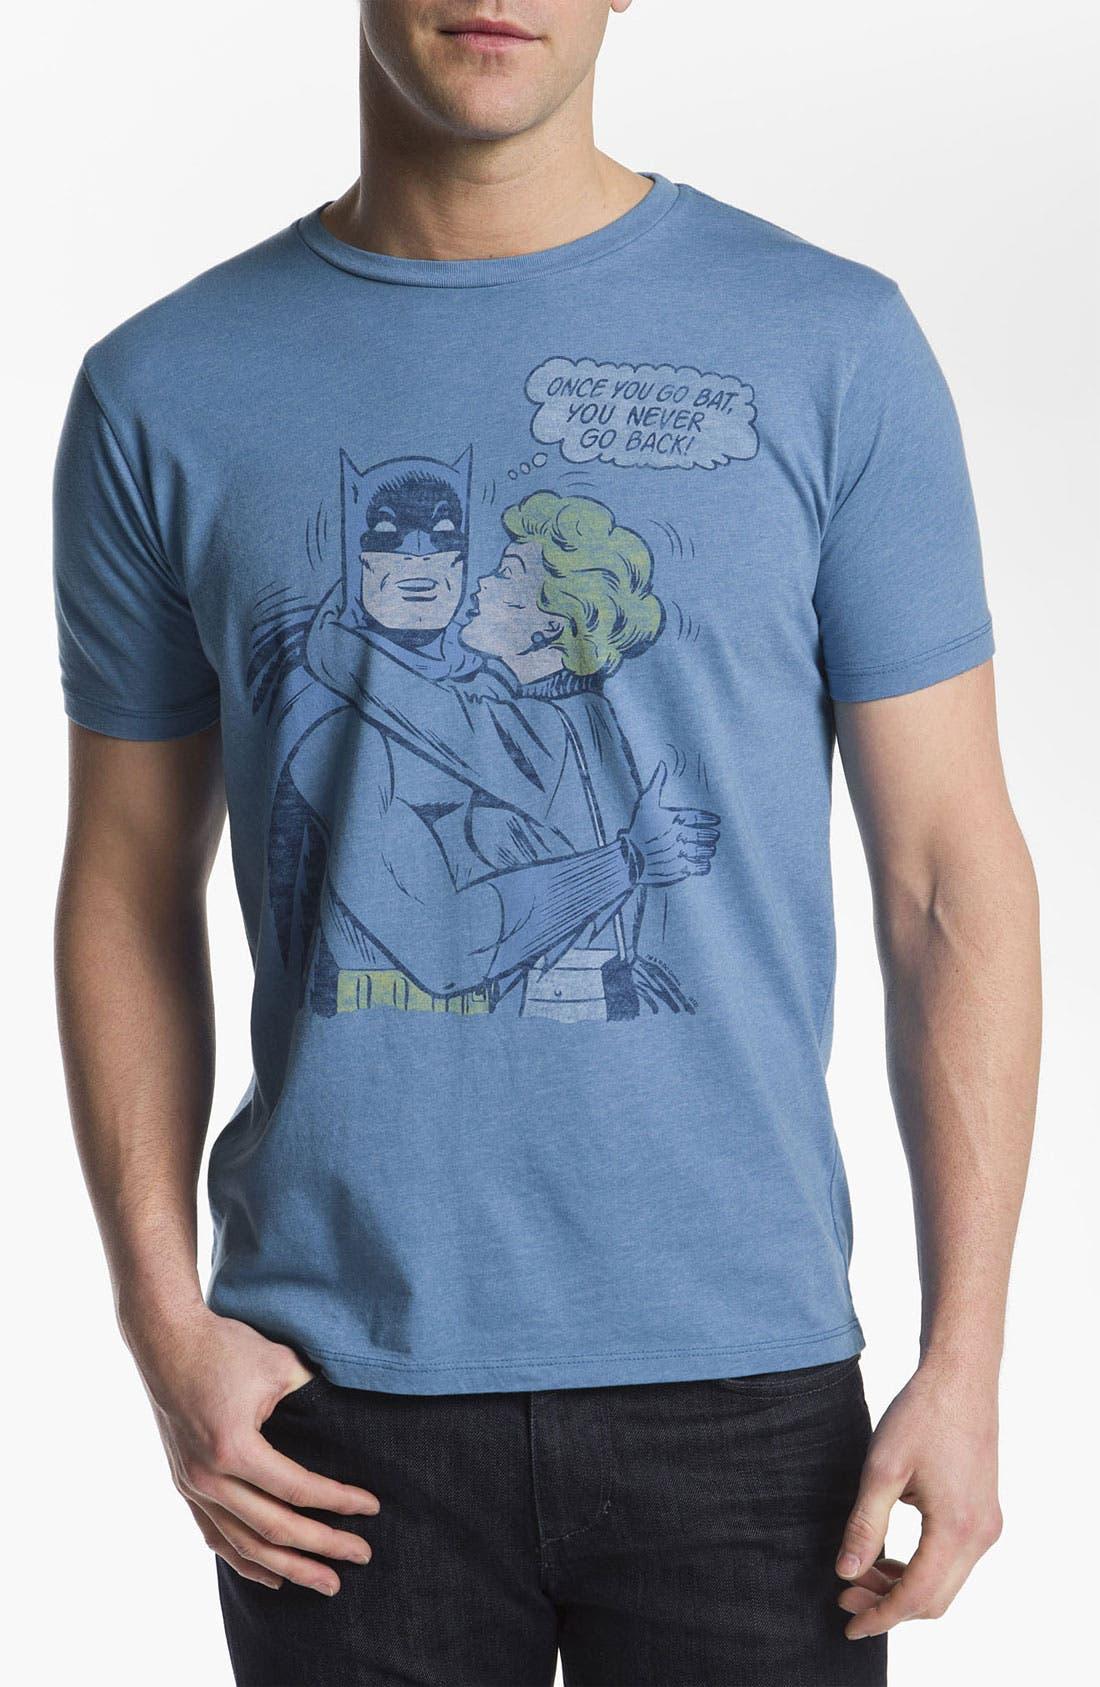 Alternate Image 1 Selected - Junk Food 'Once You Go Bat' T-Shirt